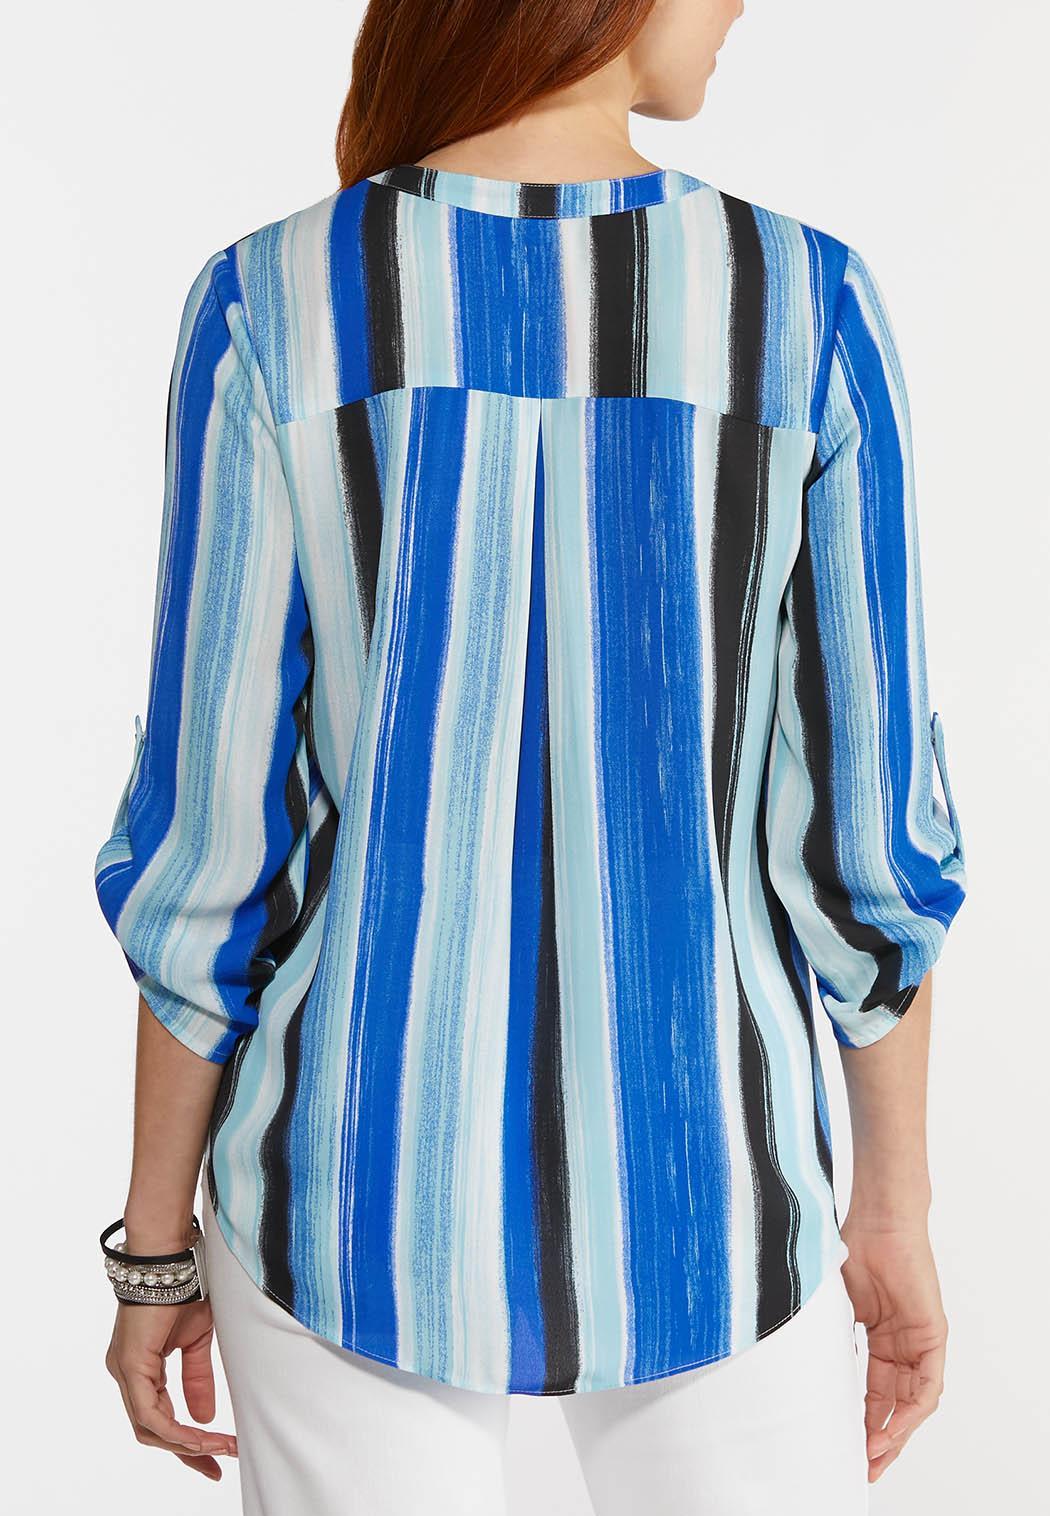 Plus Size Brilliant Blue Striped Top (Item #44279413)